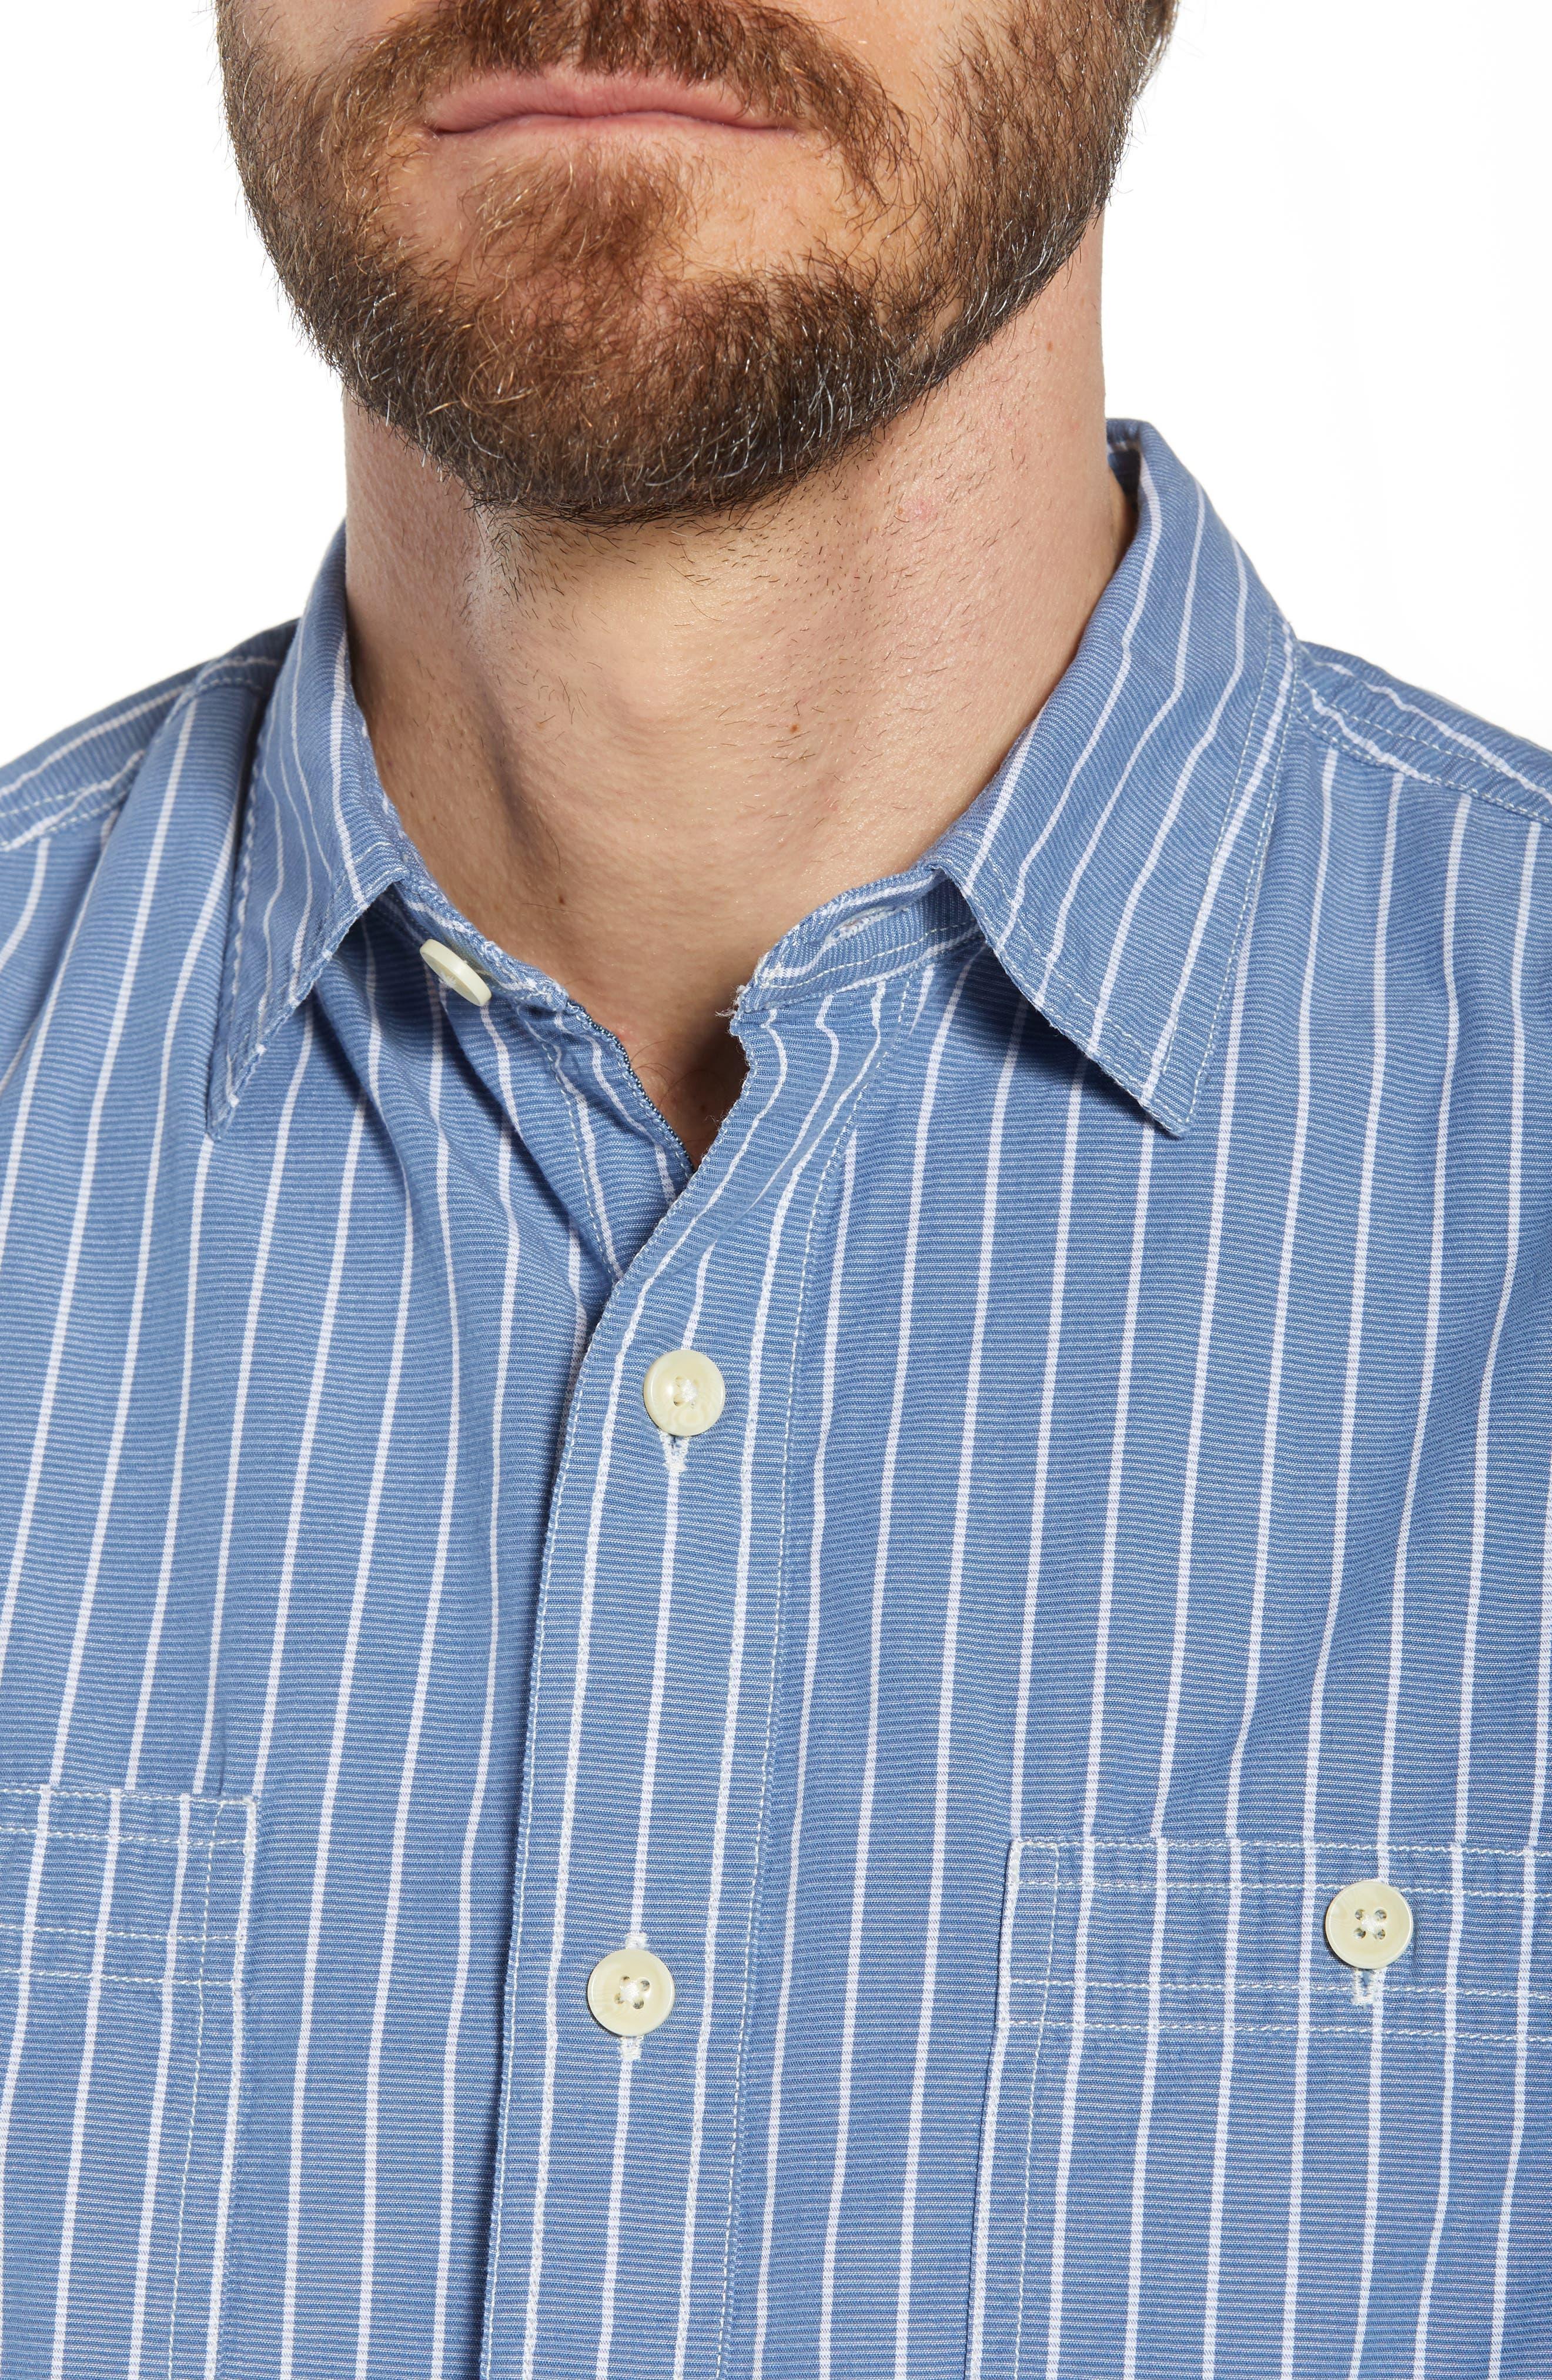 Larkin Stripe Sport Shirt,                             Alternate thumbnail 2, color,                             Blue Cream Stripe